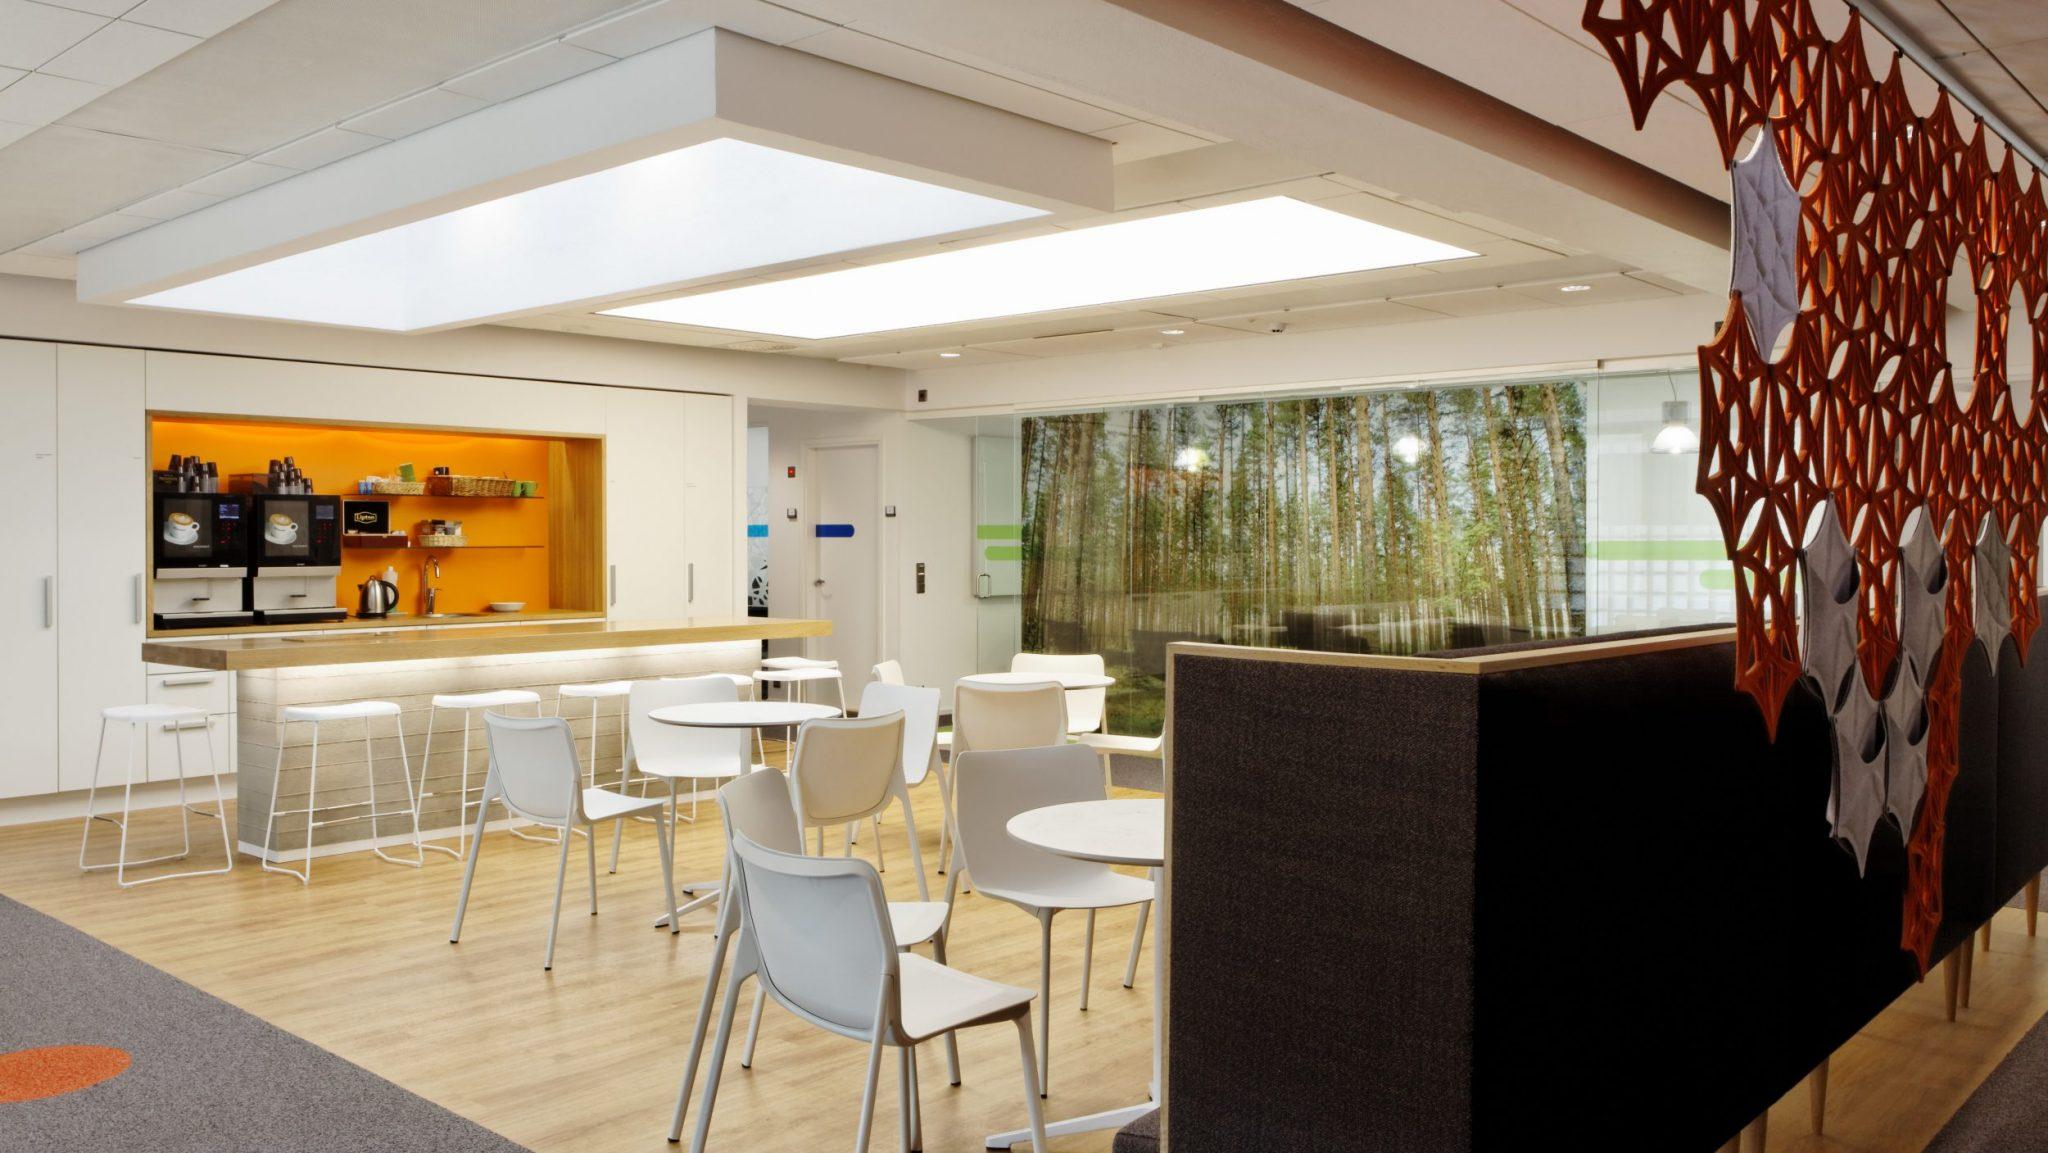 Nordea-Bank-Finland-GI-Project-2